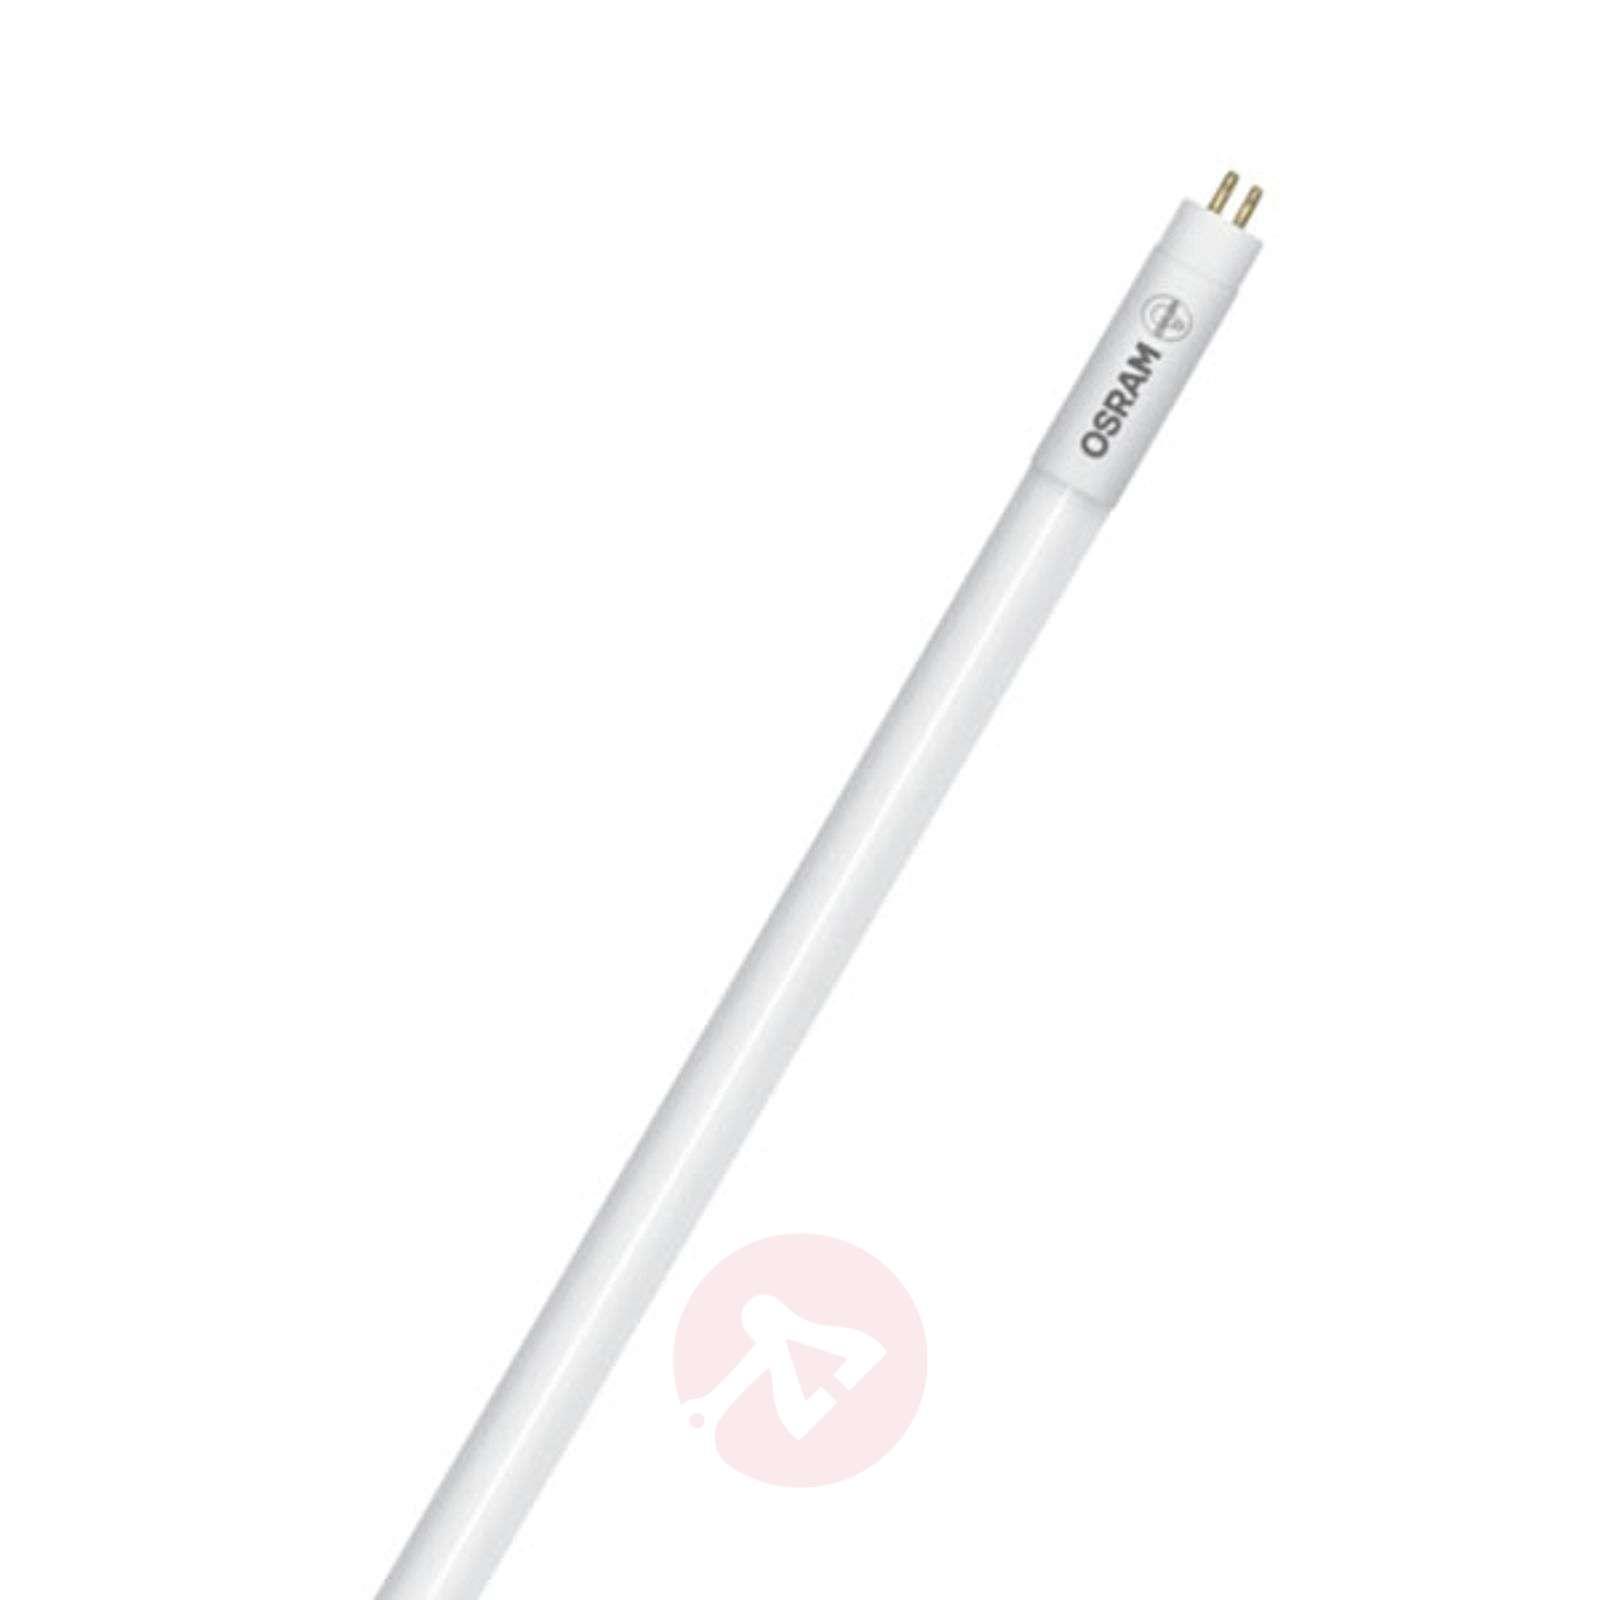 SubstiTUBE LED High Output G5 T5 37W-7262114X-01